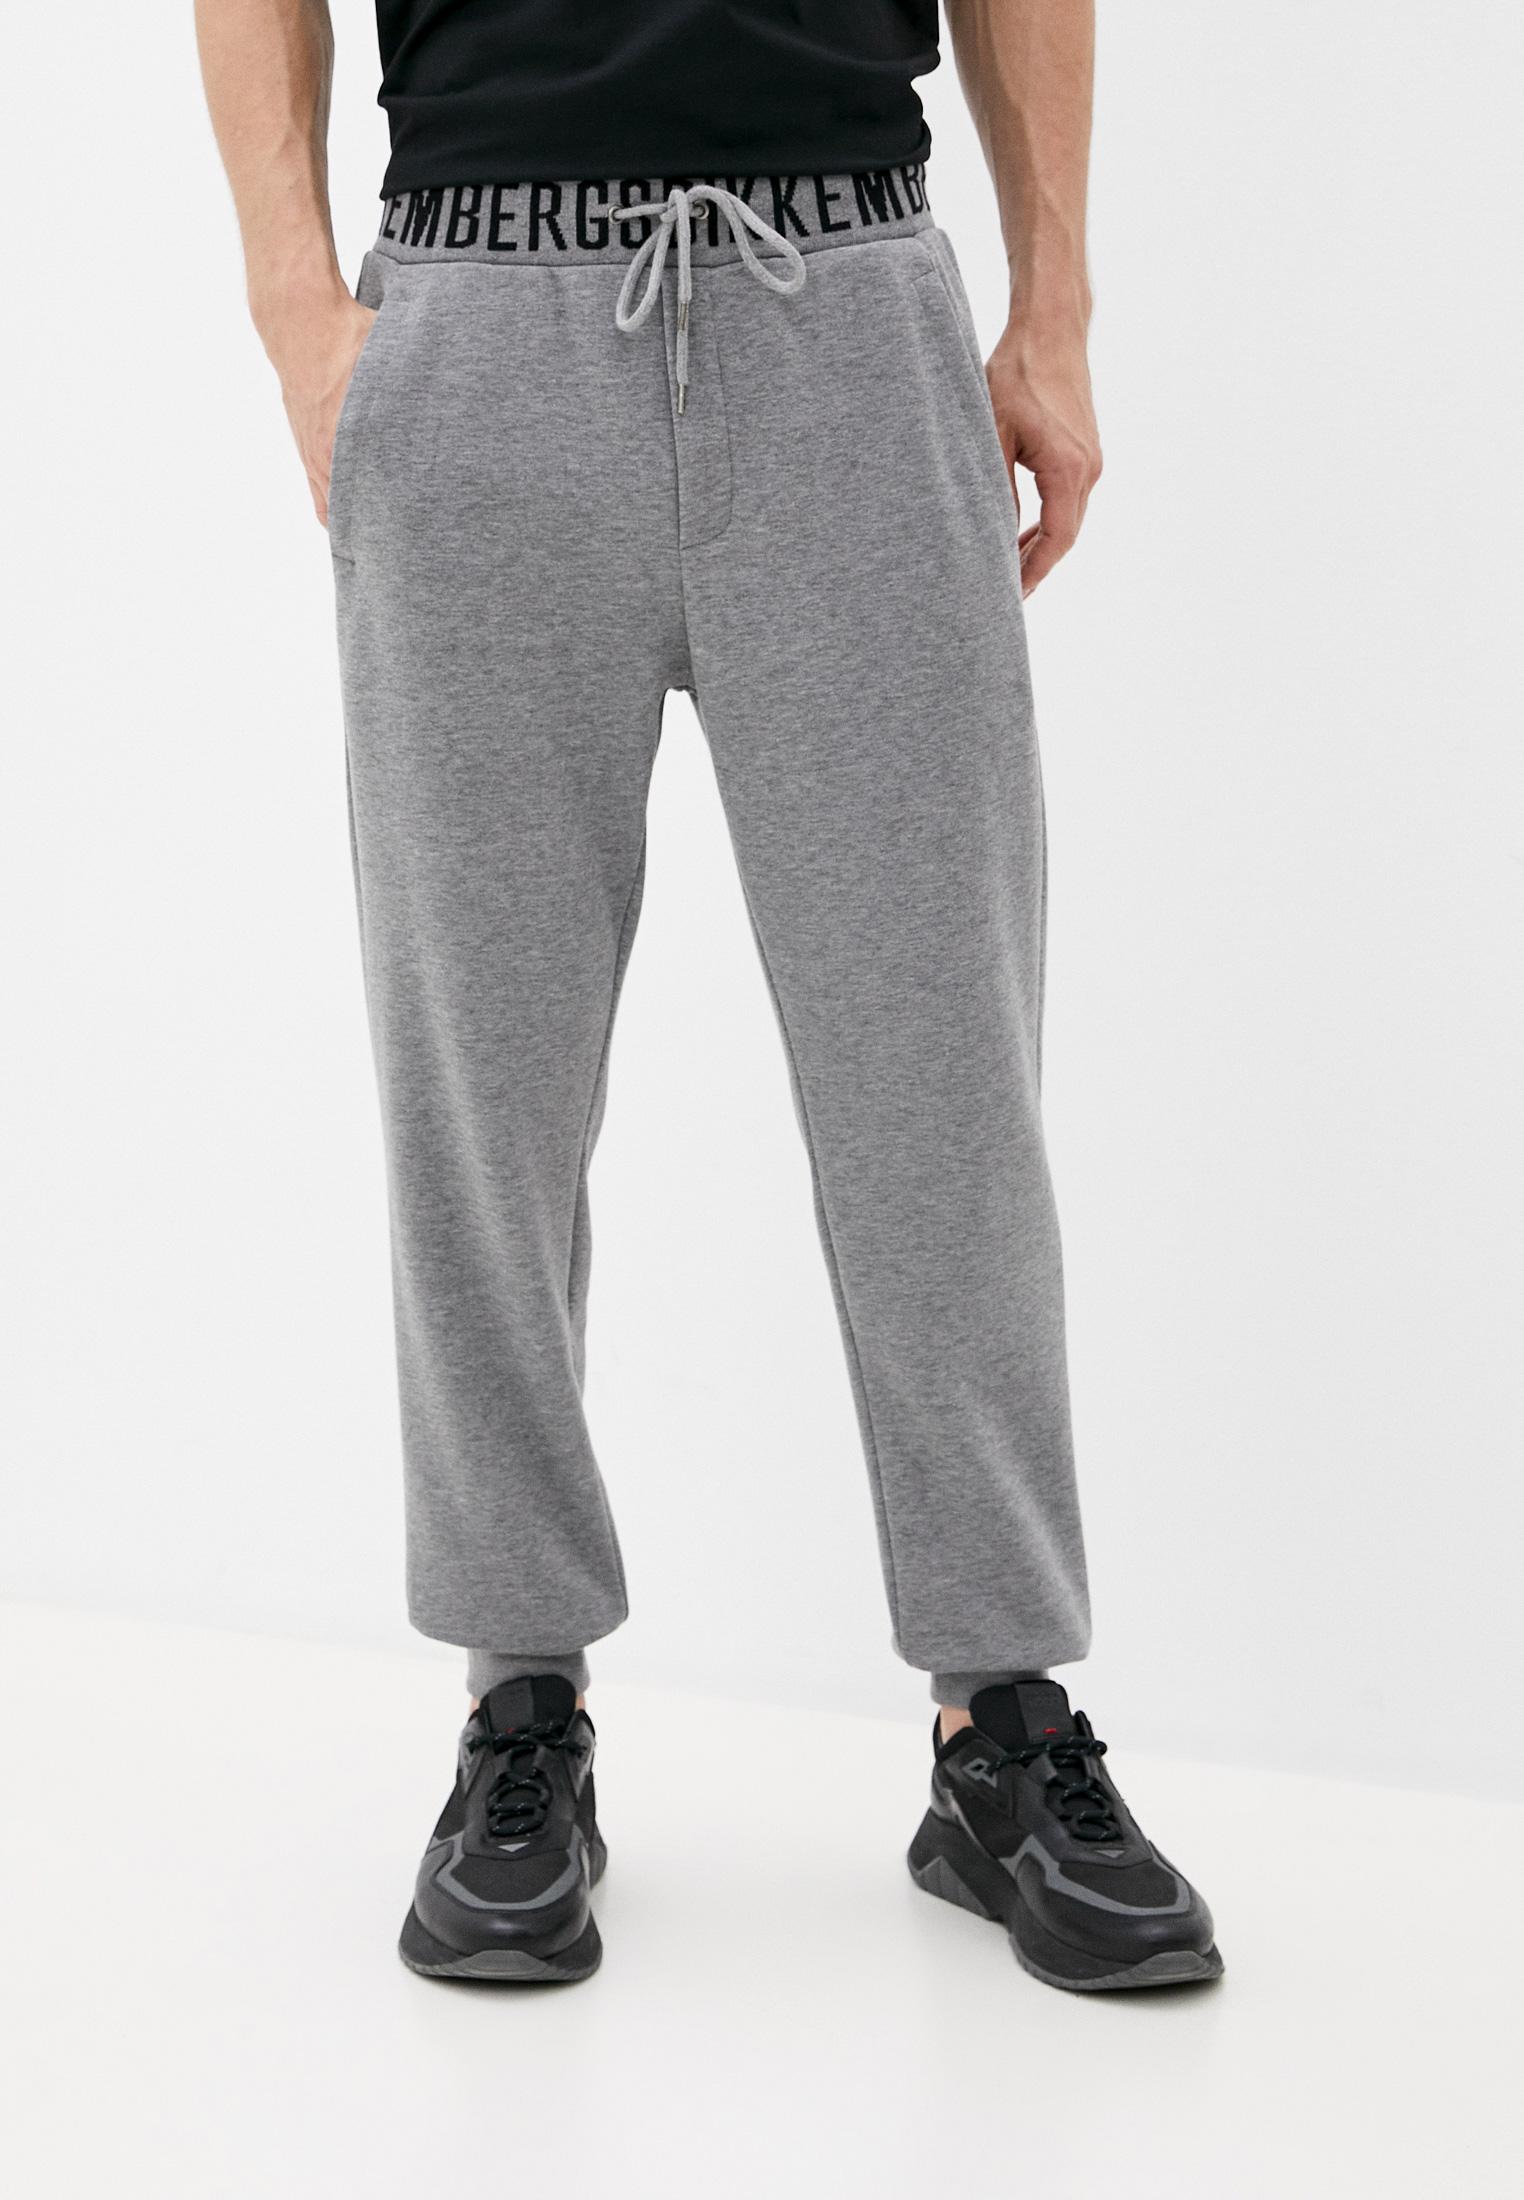 Мужские спортивные брюки Bikkembergs (Биккембергс) C 1 168 00 M 4271